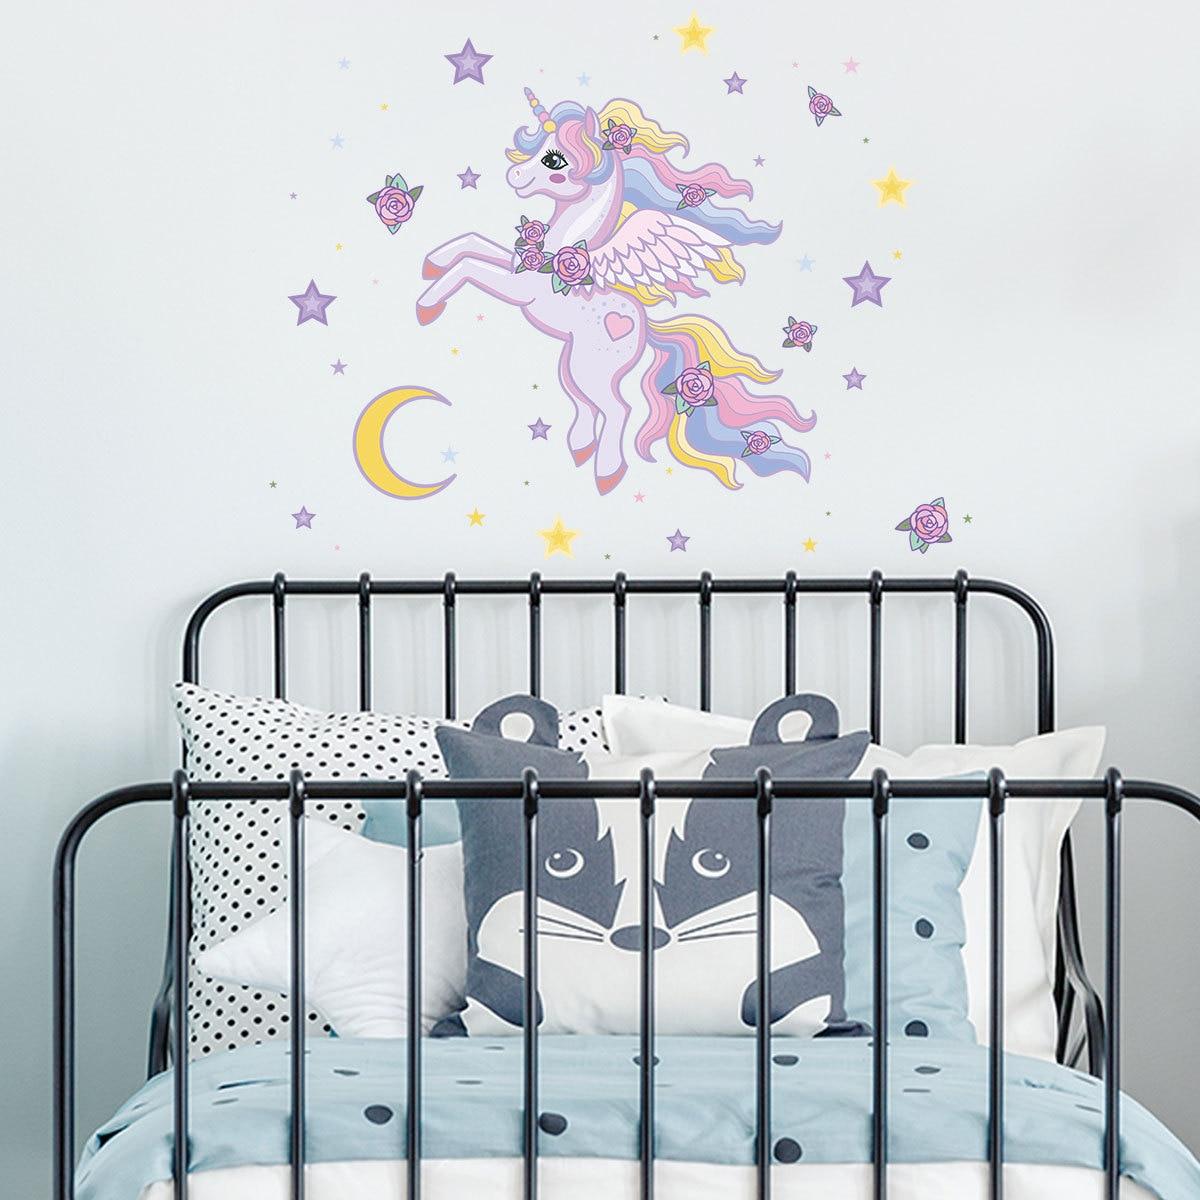 Room decor moon star unicorn cartoon wall stickers for kids rooms living room bedroom wall sticker